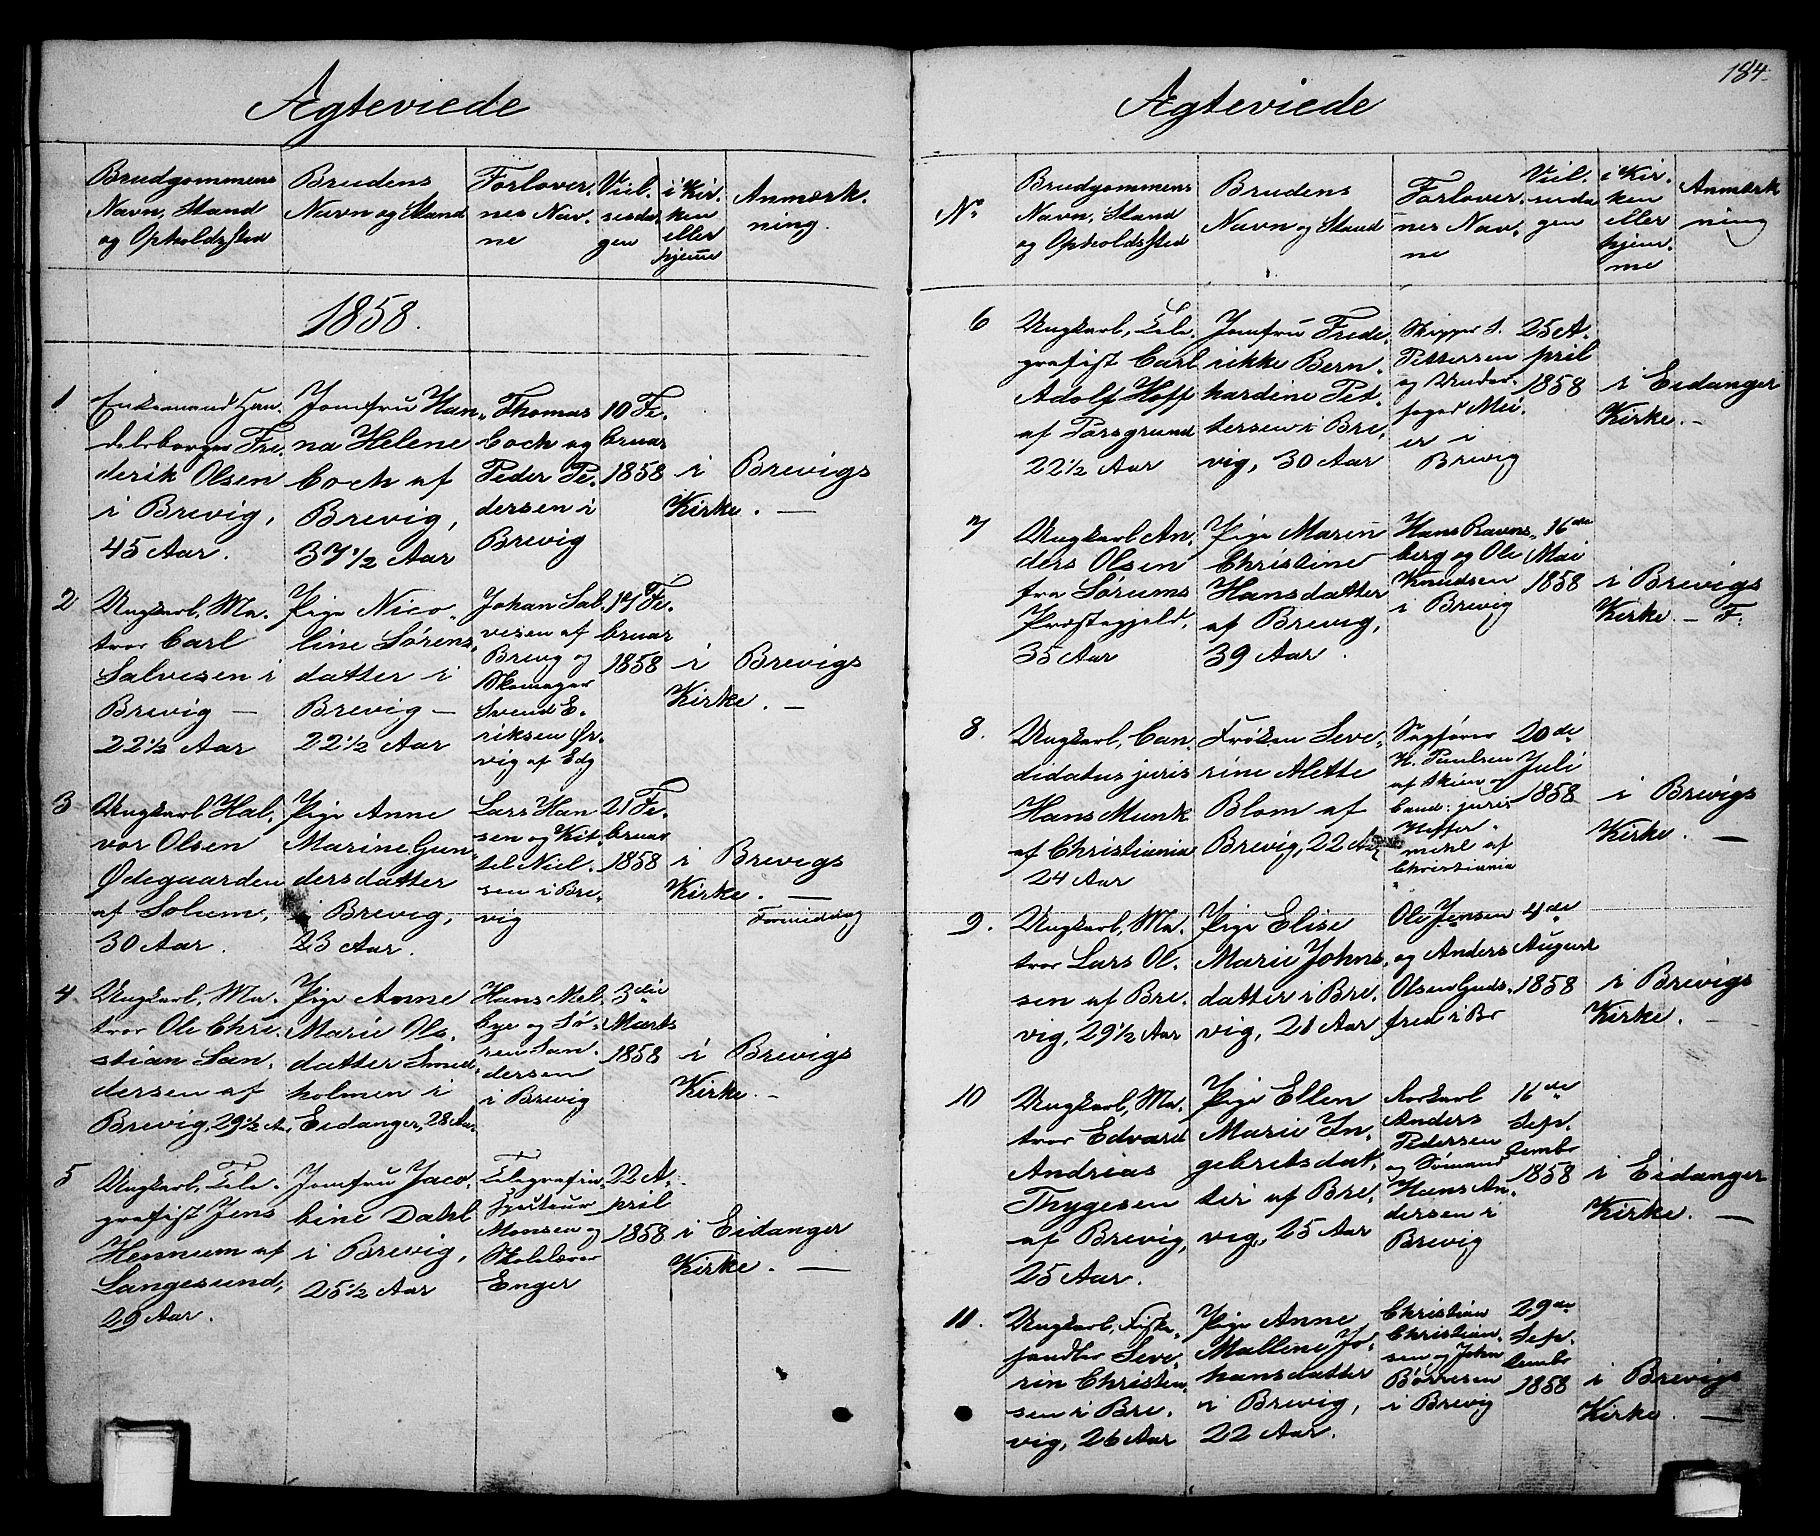 SAKO, Brevik kirkebøker, G/Ga/L0002: Klokkerbok nr. 2, 1846-1865, s. 184